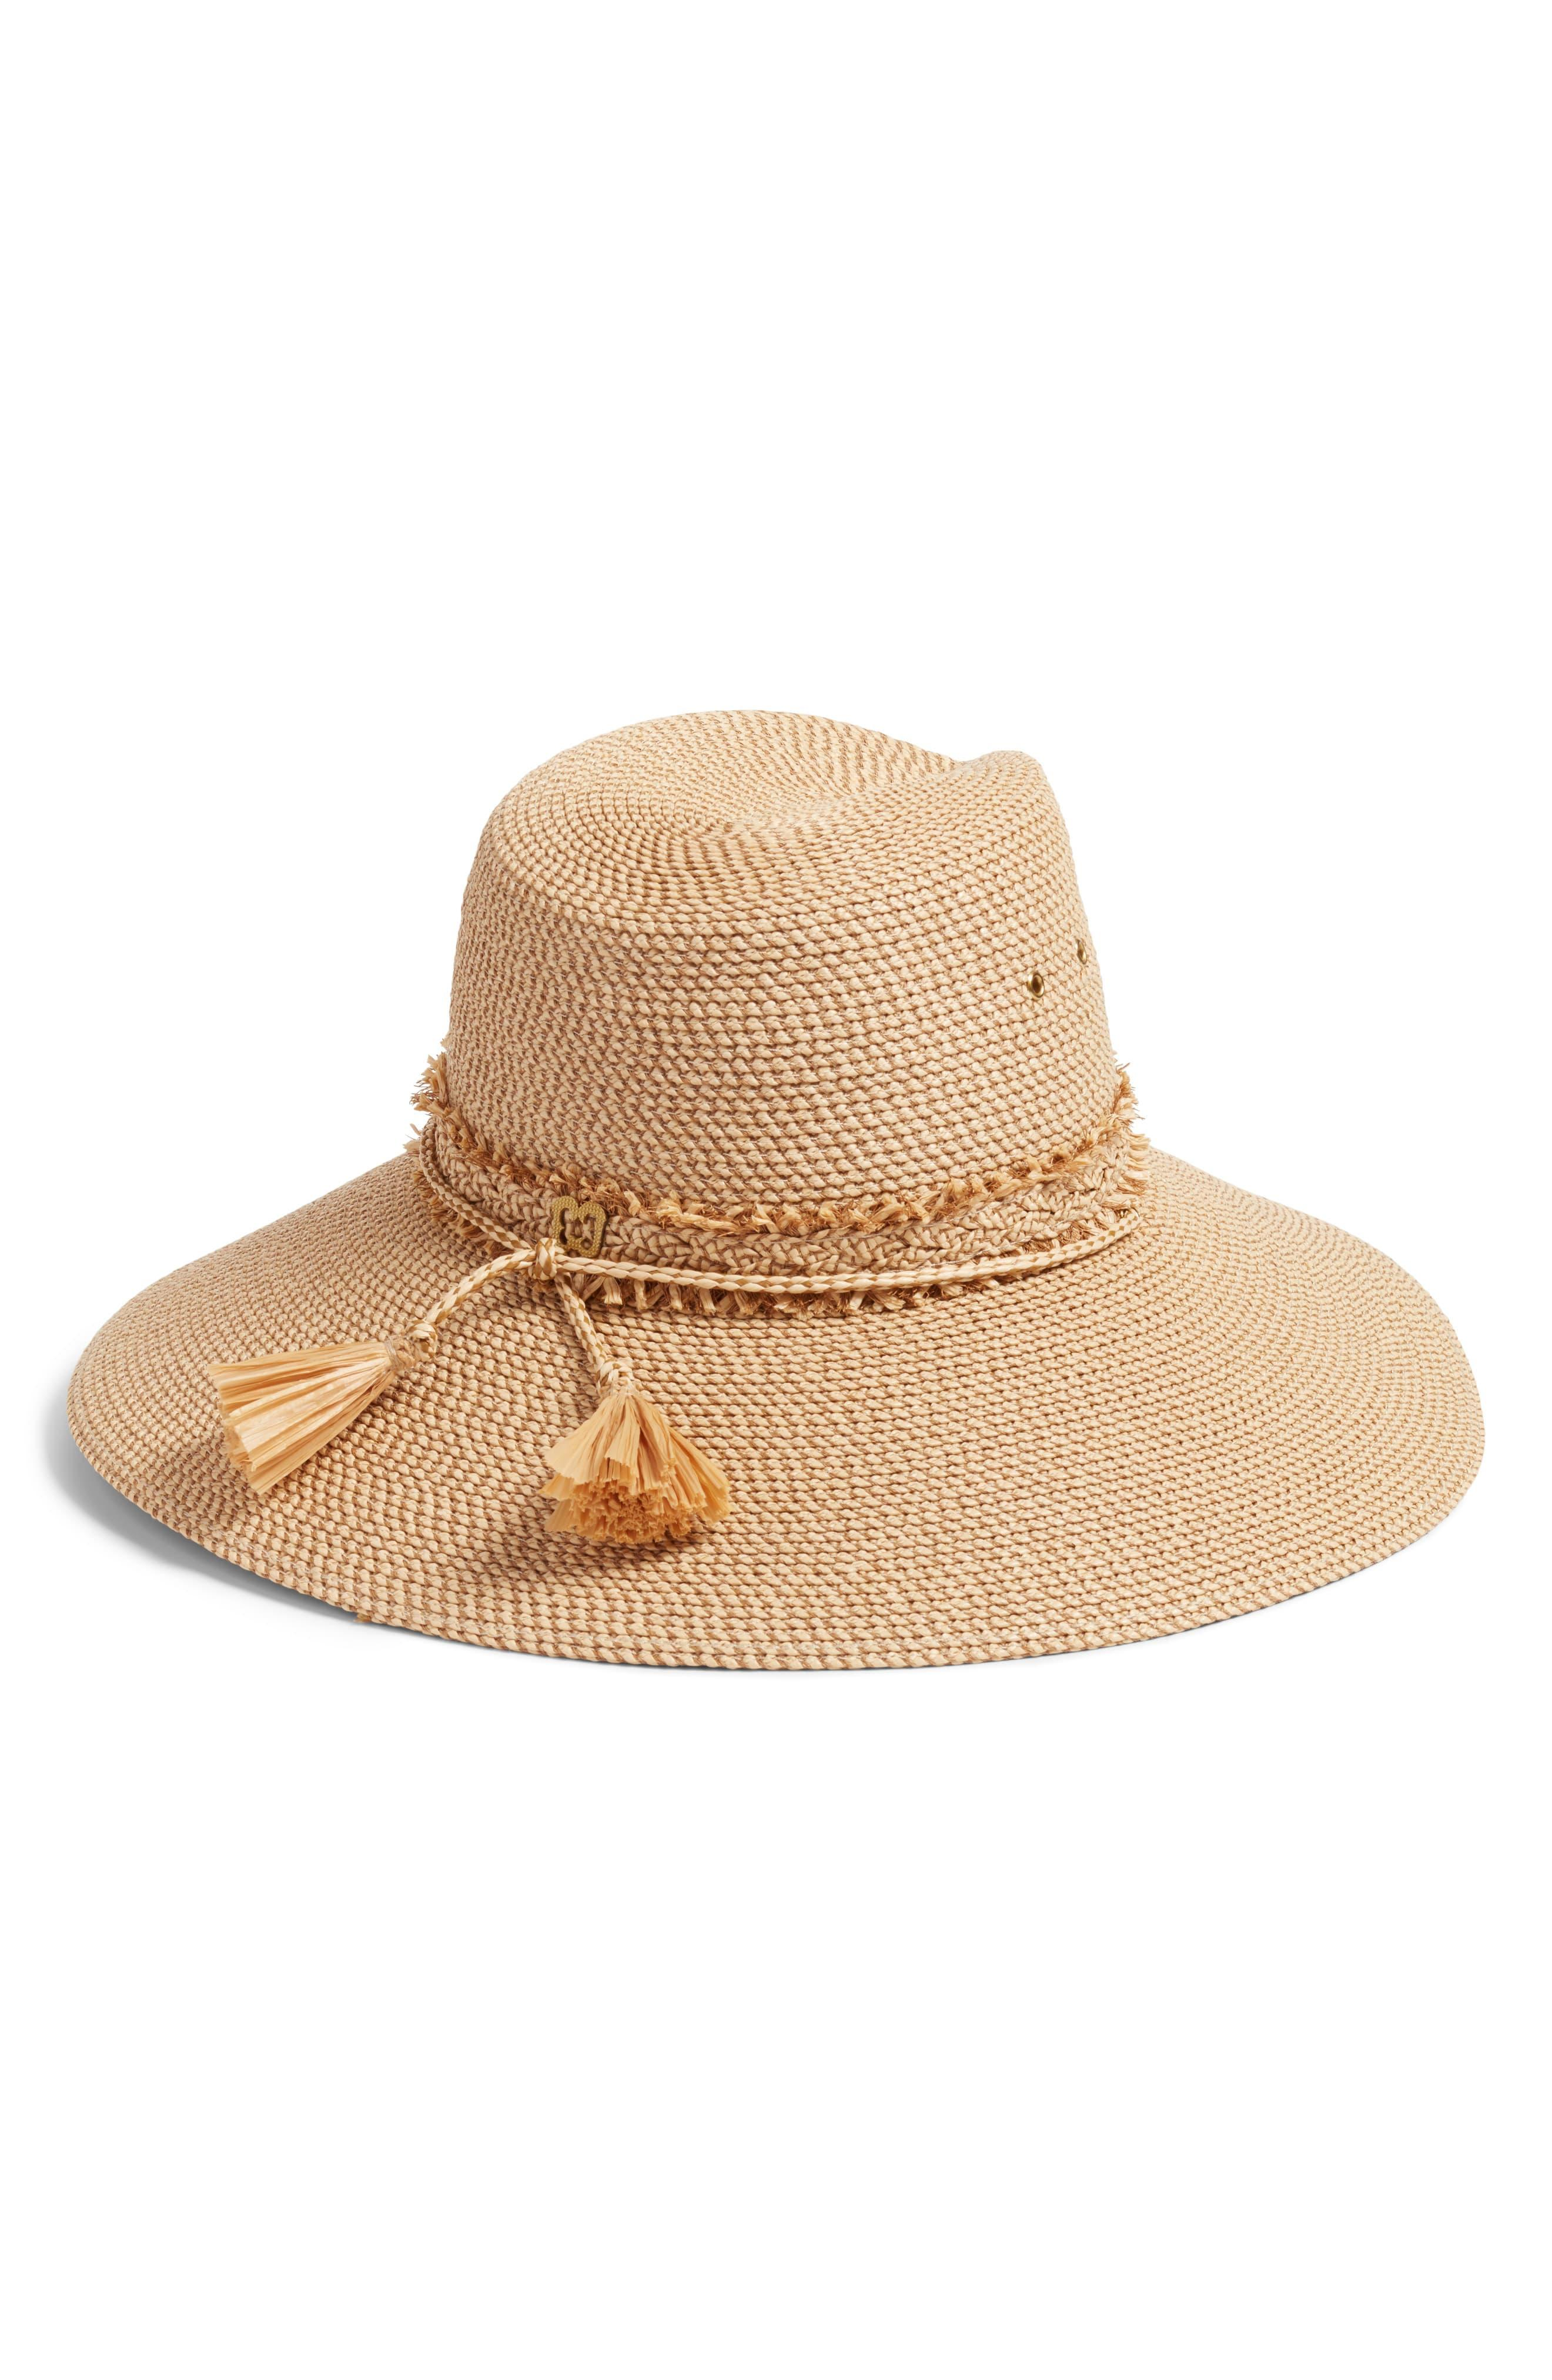 805f8fac16554 Eric Javits - Natural Voyager Packable Sun Hat - Lyst. View fullscreen